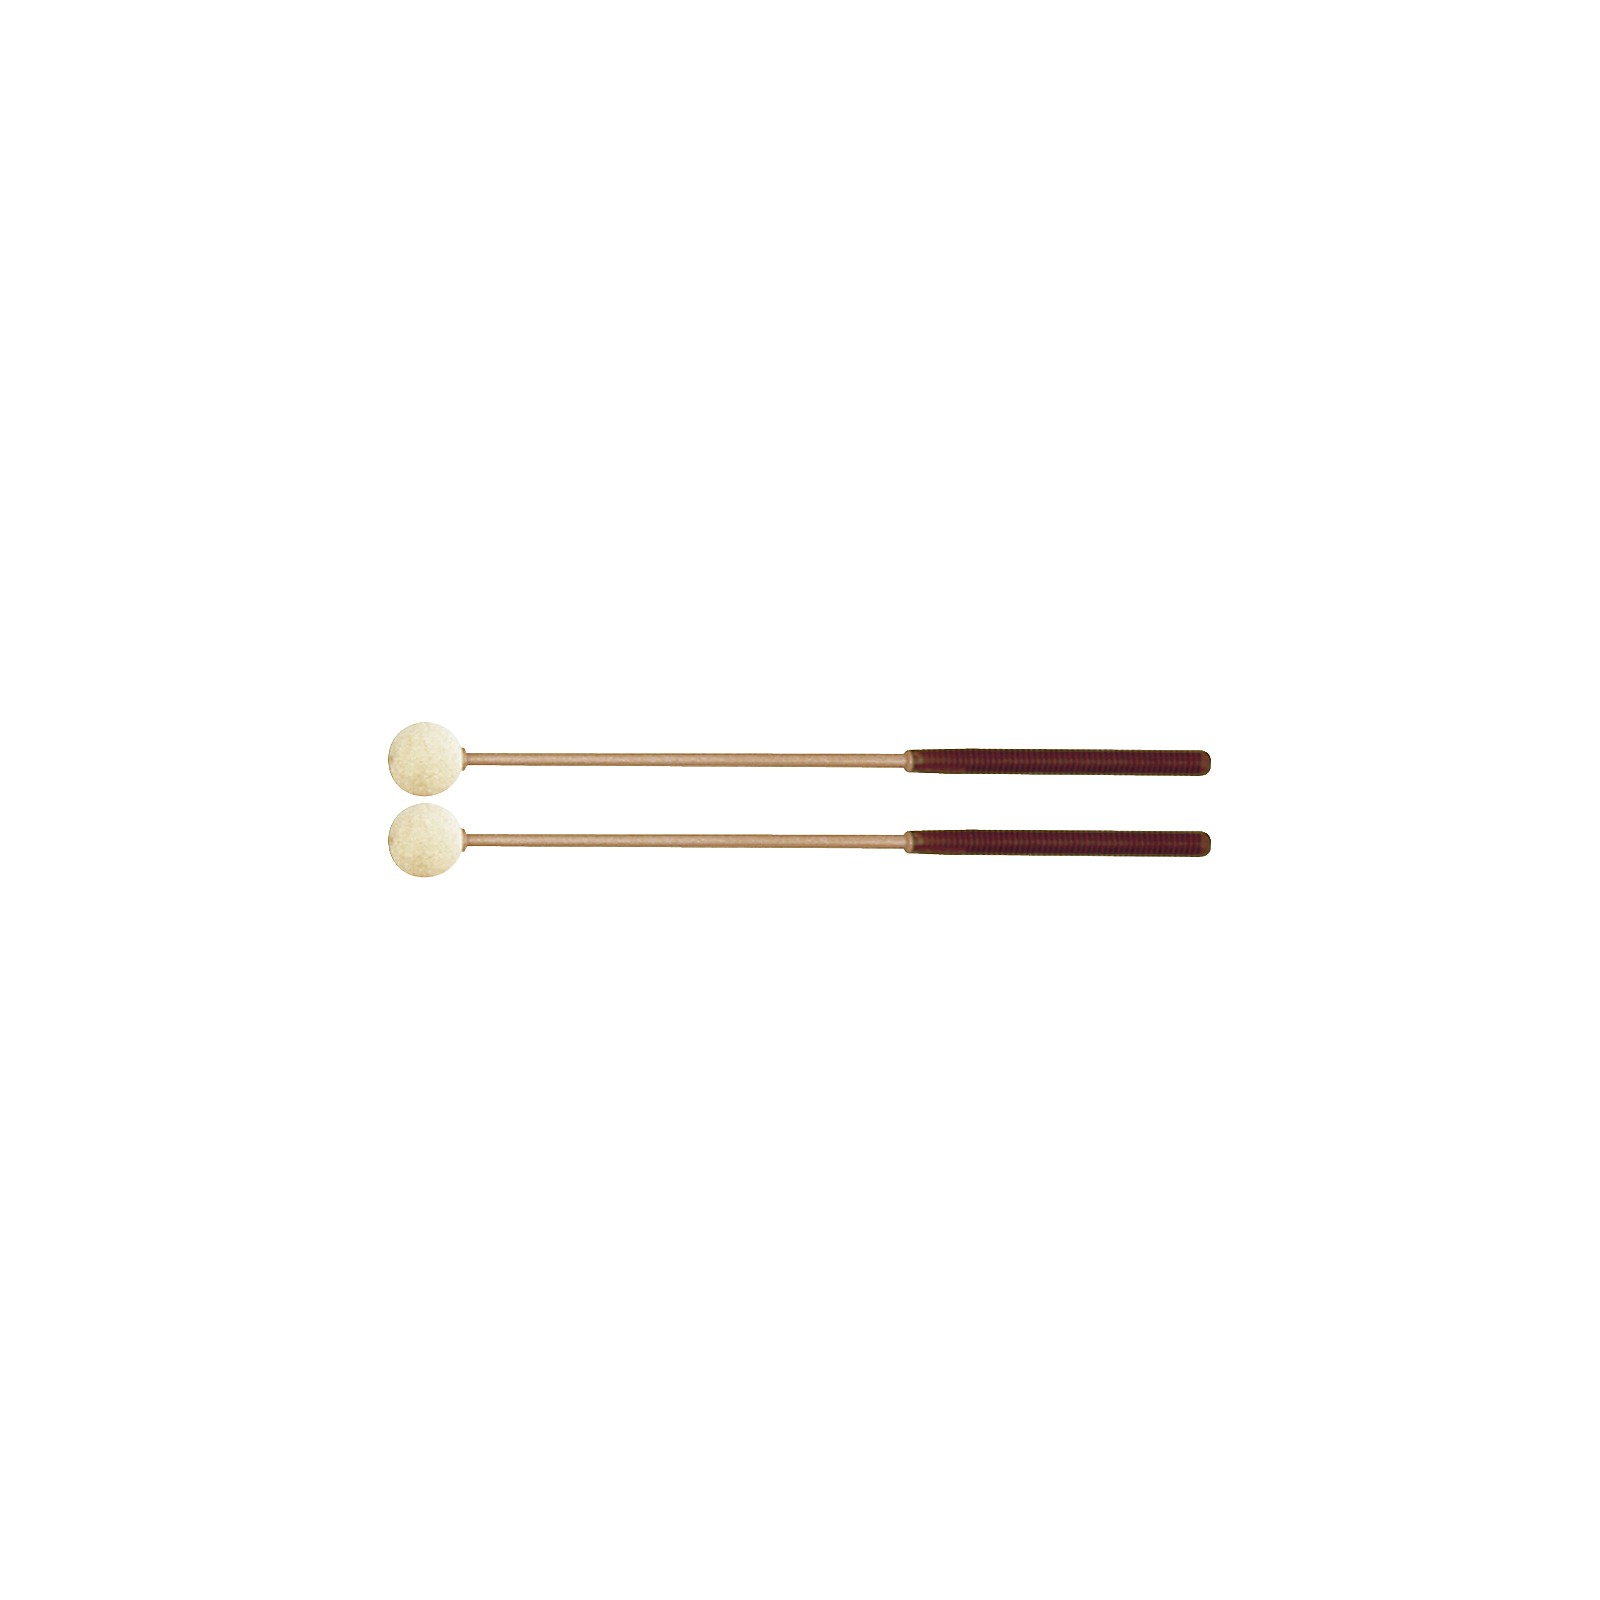 Studio 49 S4 Medium-Hard Felt Head Soprano/Alto Xylophone Mallets